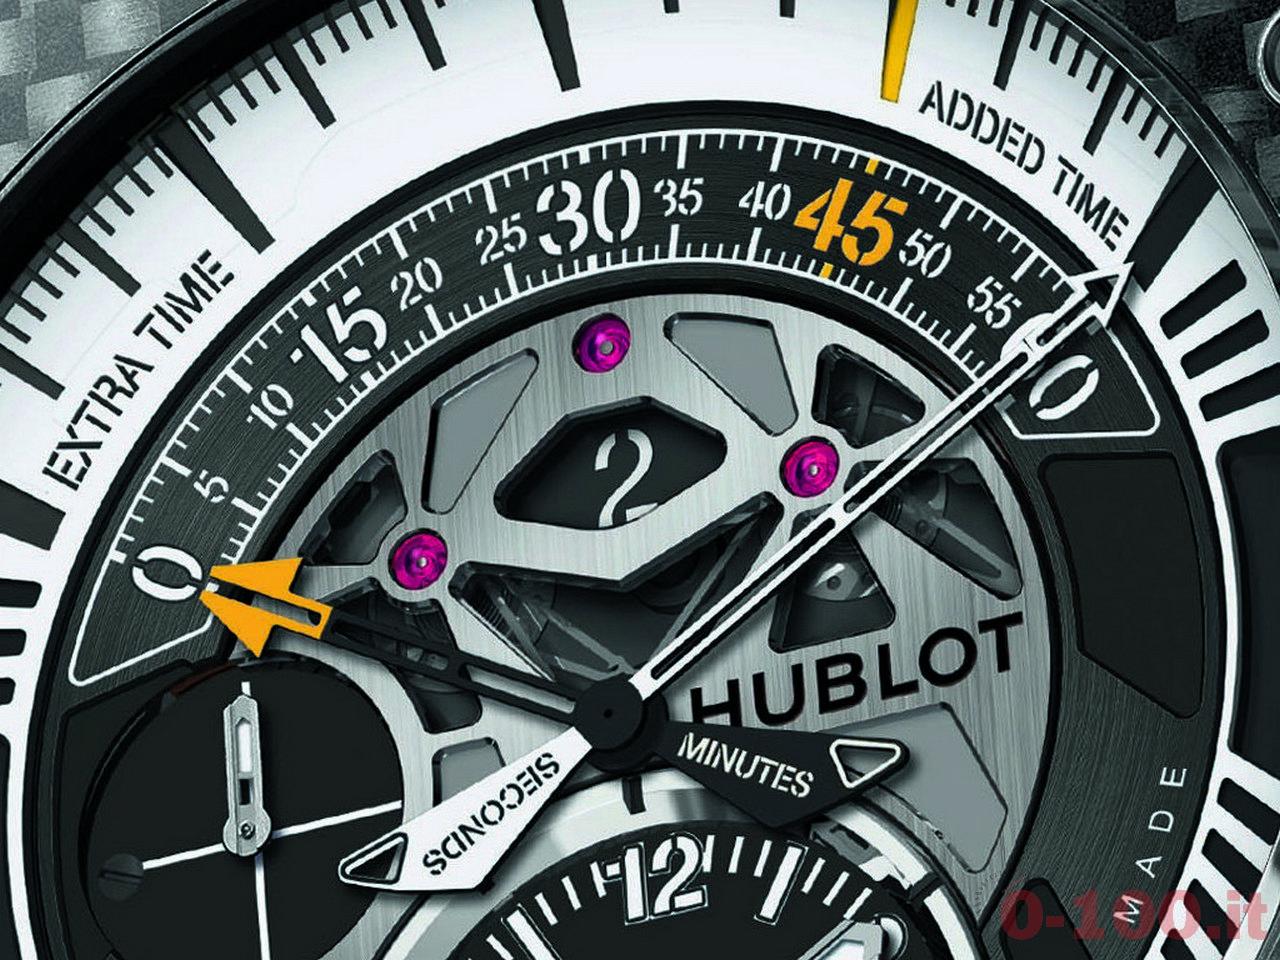 hublot-big-bang-unico-bi-retrograde-juventus-prezzo-price_0-1003